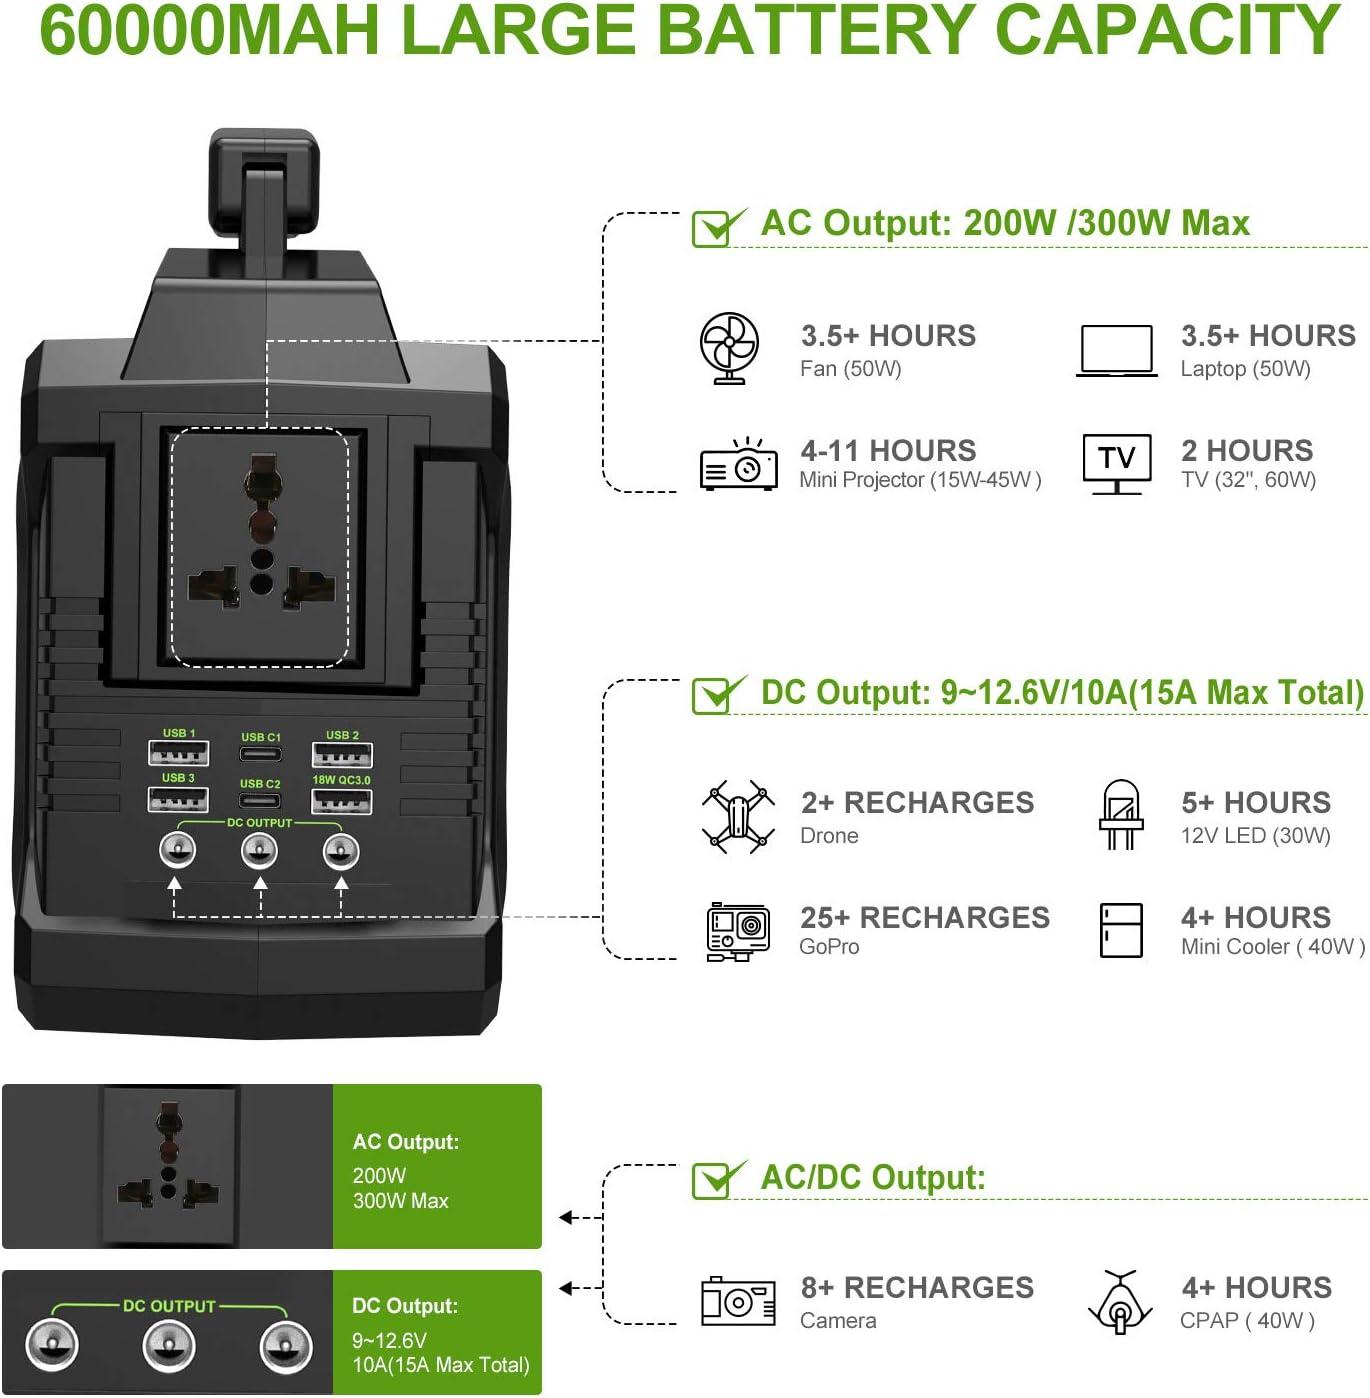 ENKEEO S220 222Wh Portable Power Bank Solargenerator Mobiler Energiespeicher EU